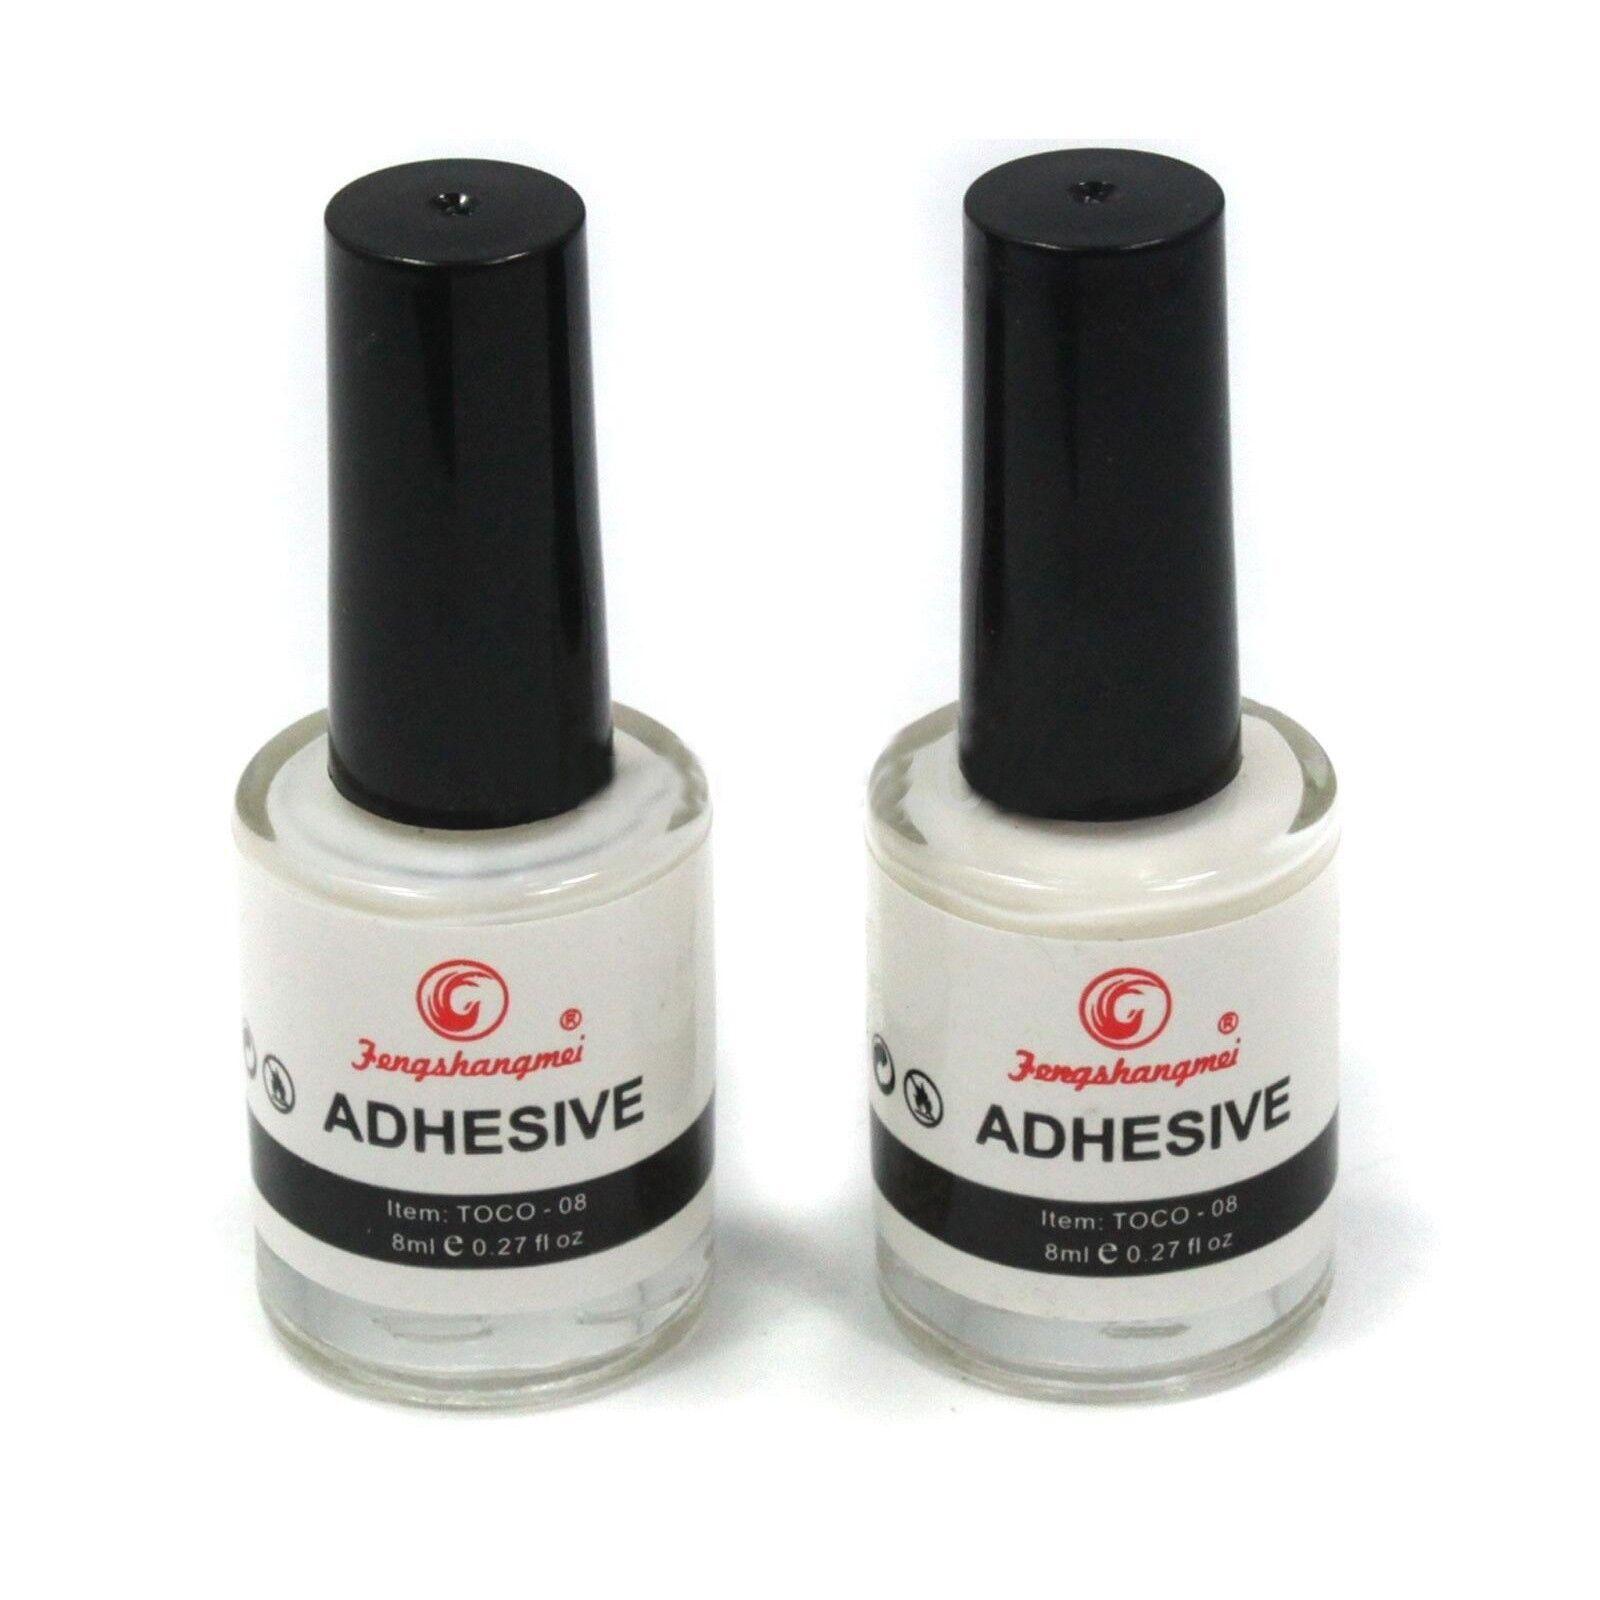 Glue Adhesive For Galaxy Star Foil Sticker Nail Art Transfer Tips